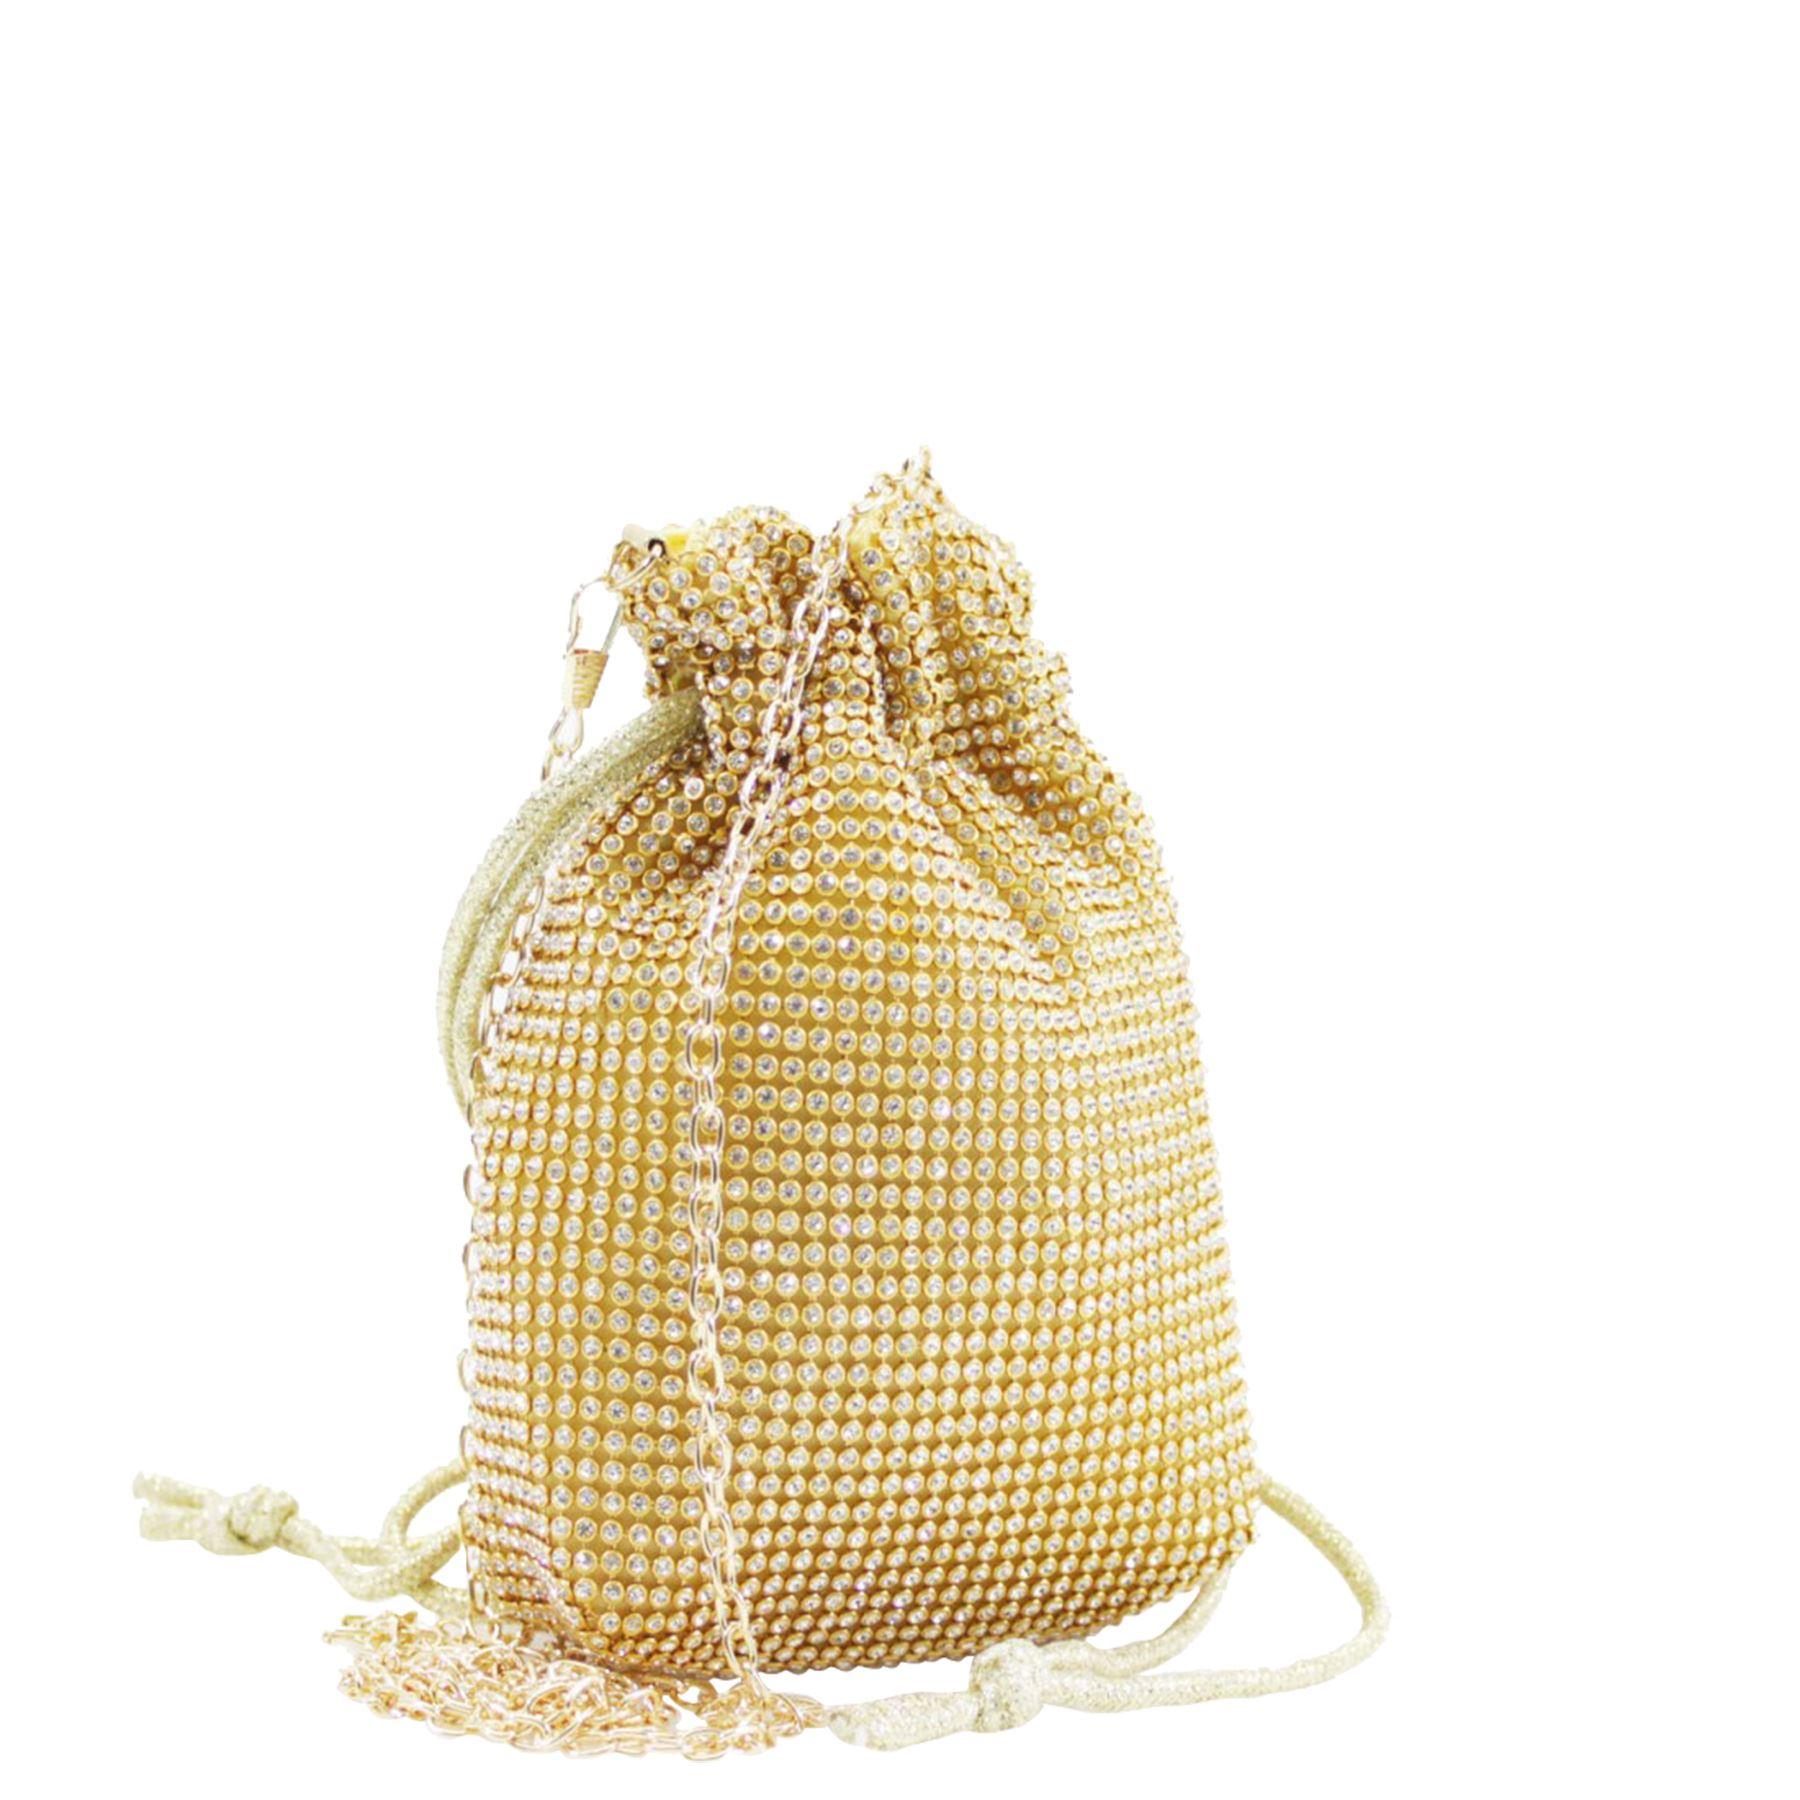 New-Ladies-Rhinestone-Diamante-Drawstring-Chain-Strap-Pouch-Bag thumbnail 4